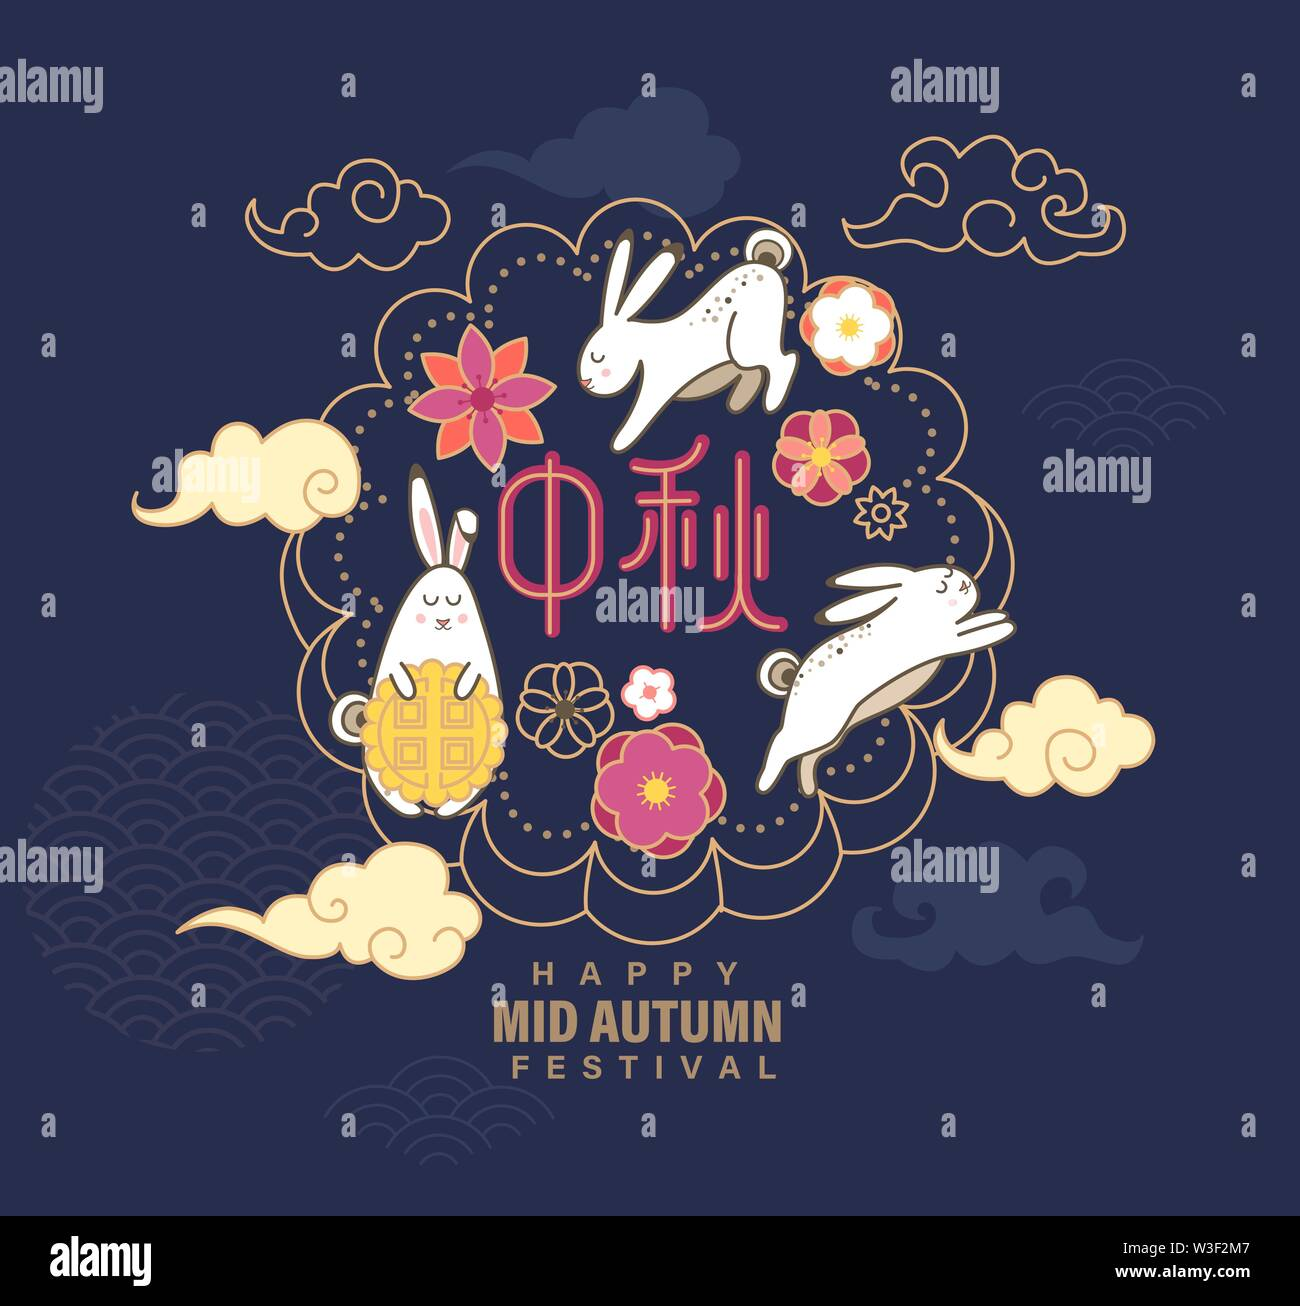 Mid Autumn Festival banner. - Stock Image